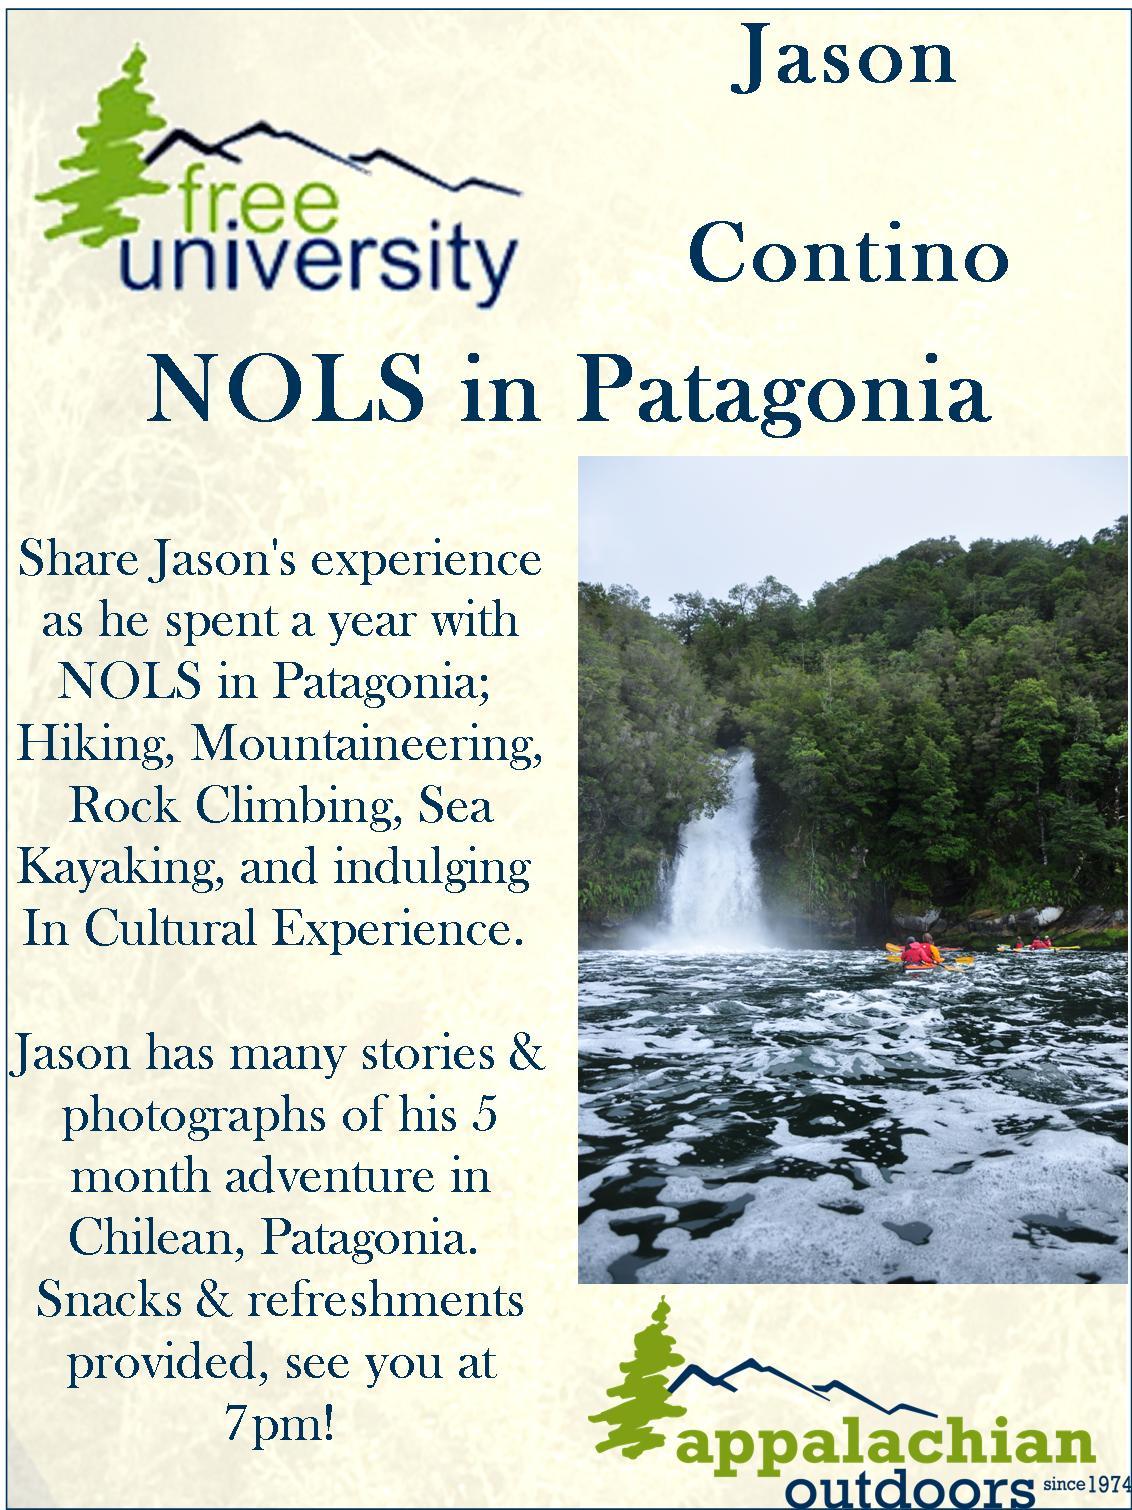 Jason Contino 4-26-2011